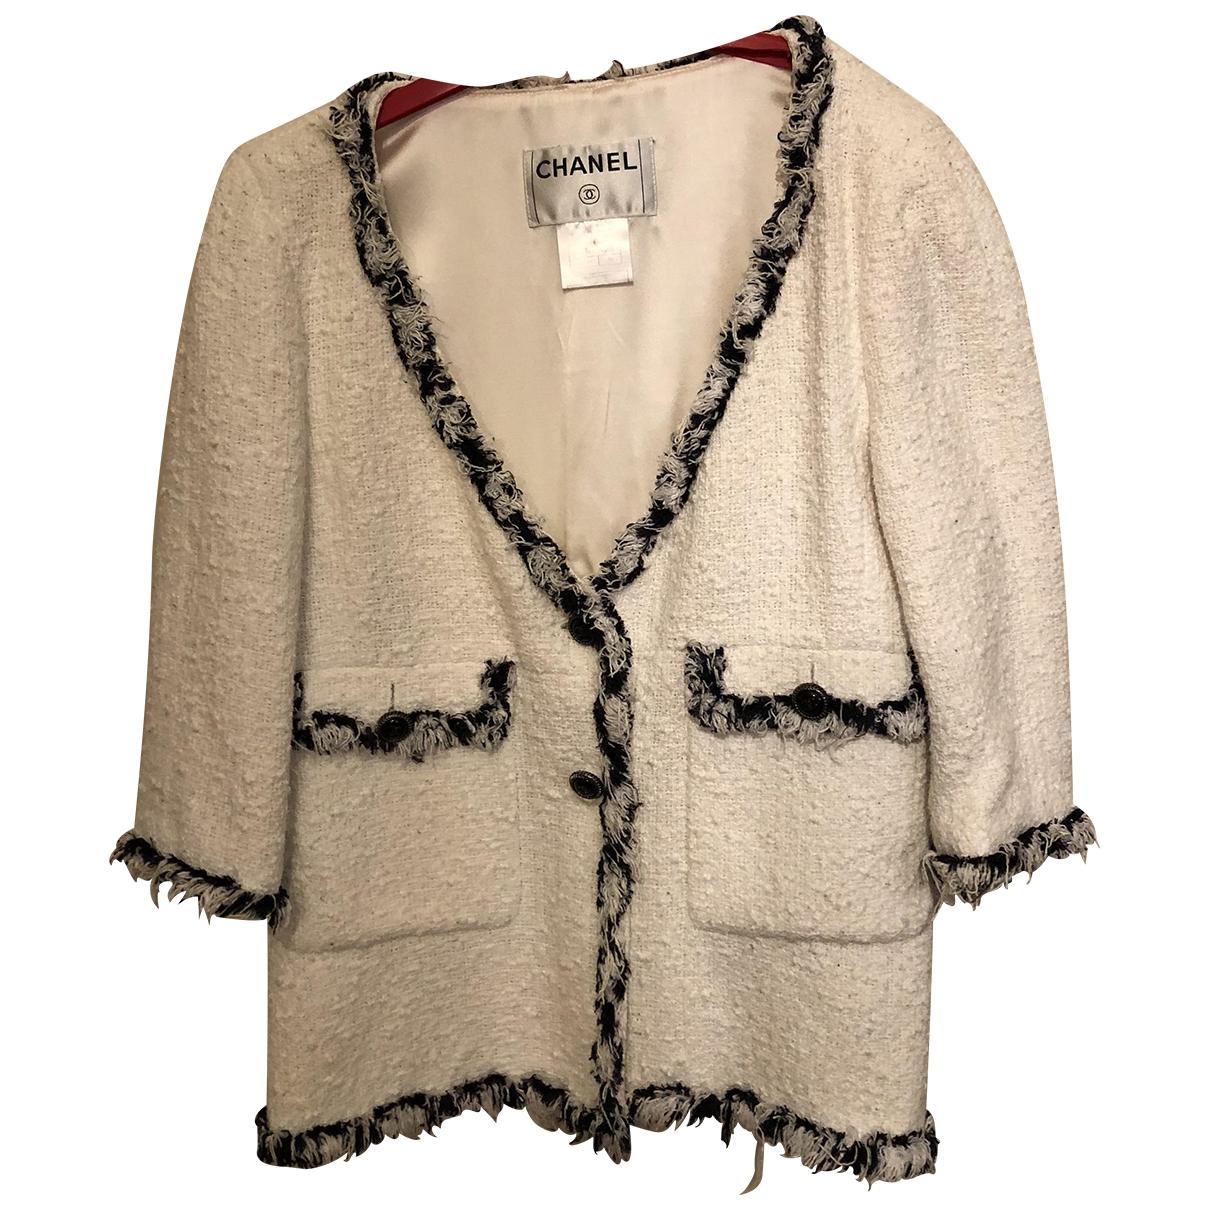 Chanel \N Beige Tweed jacket for Women 38 FR